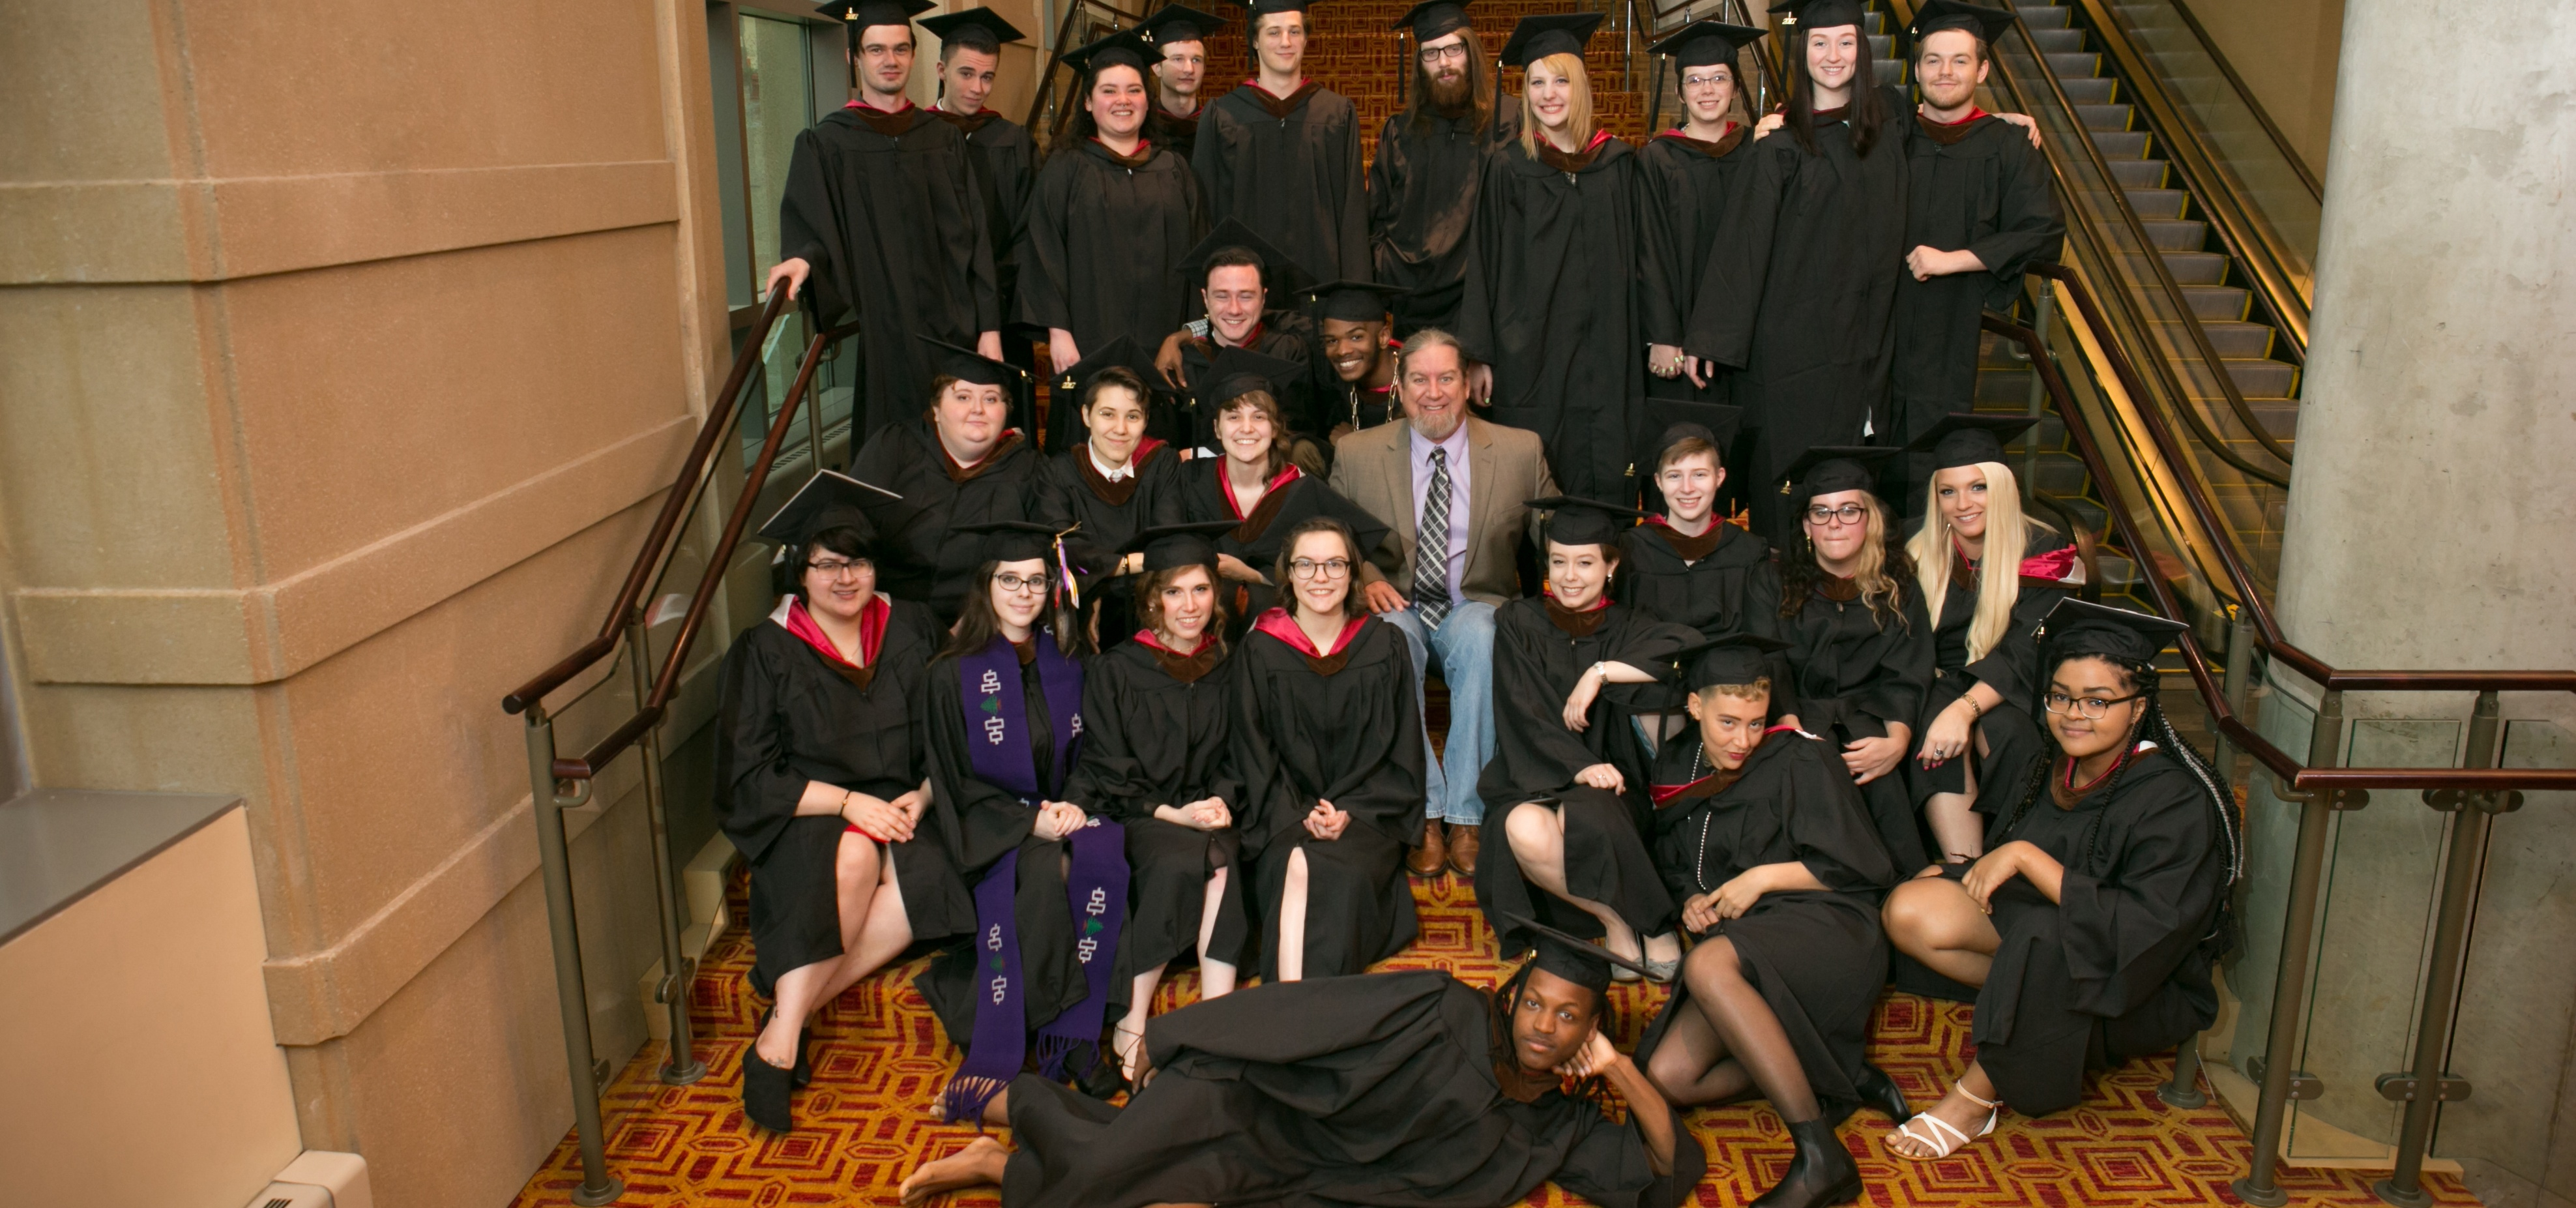 PCAD_Graduation2017_0013 cropped